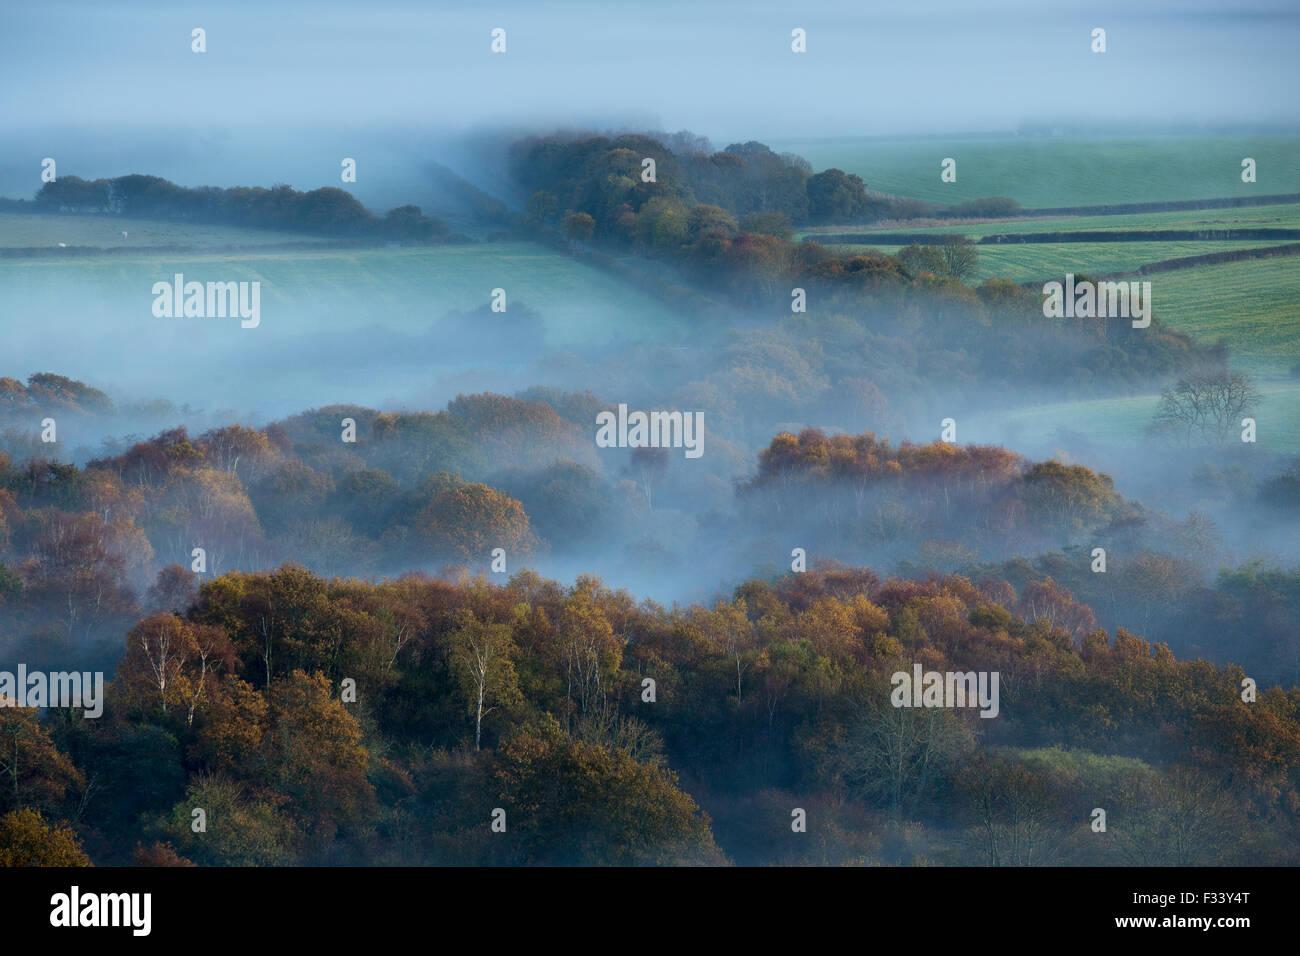 Una mañana brumosa en la Isla de Purbeck nr castillo Corfe, en Dorset, Inglaterra Imagen De Stock